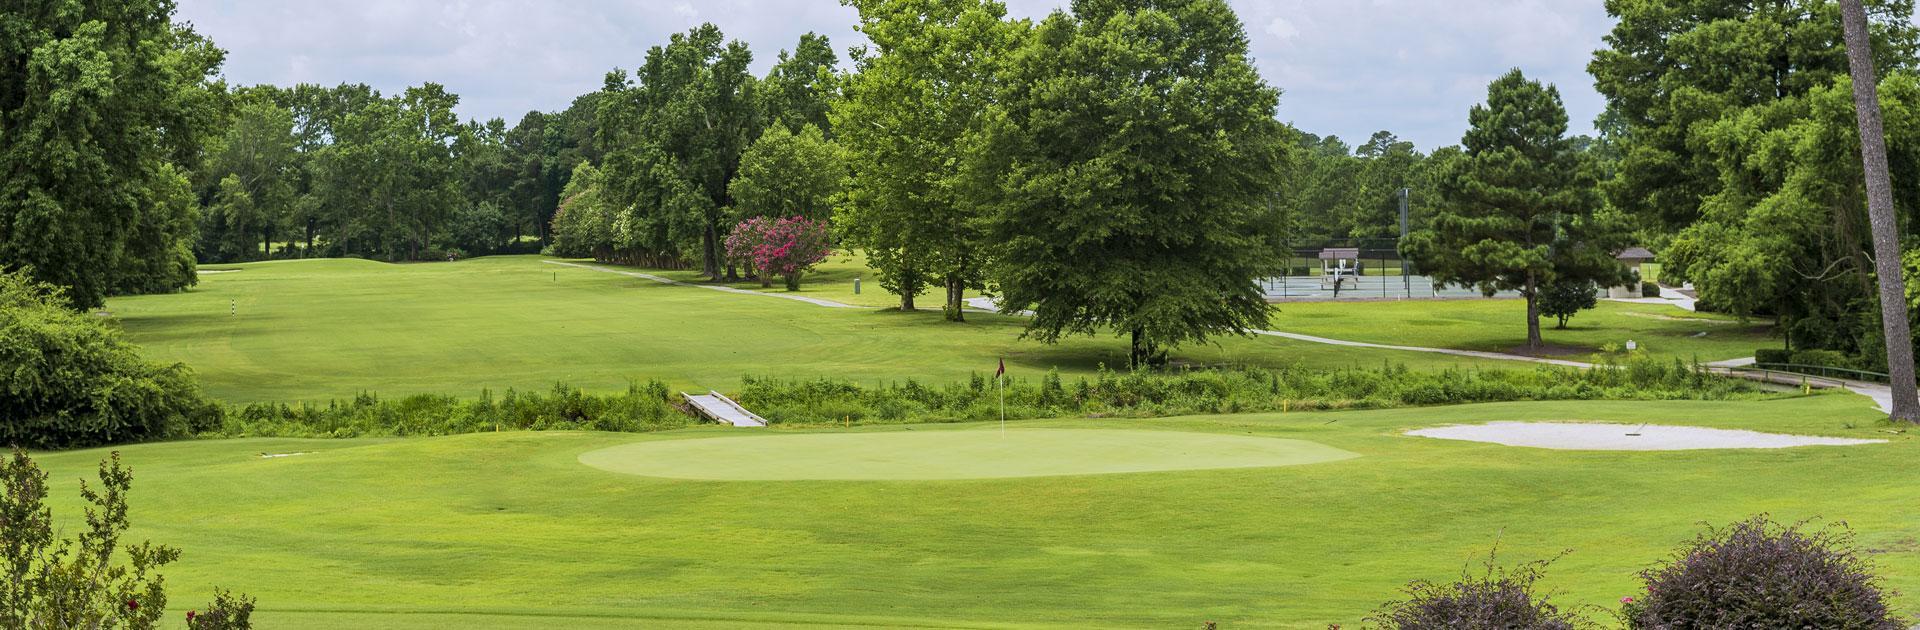 MGA - Pine Valley Country Club